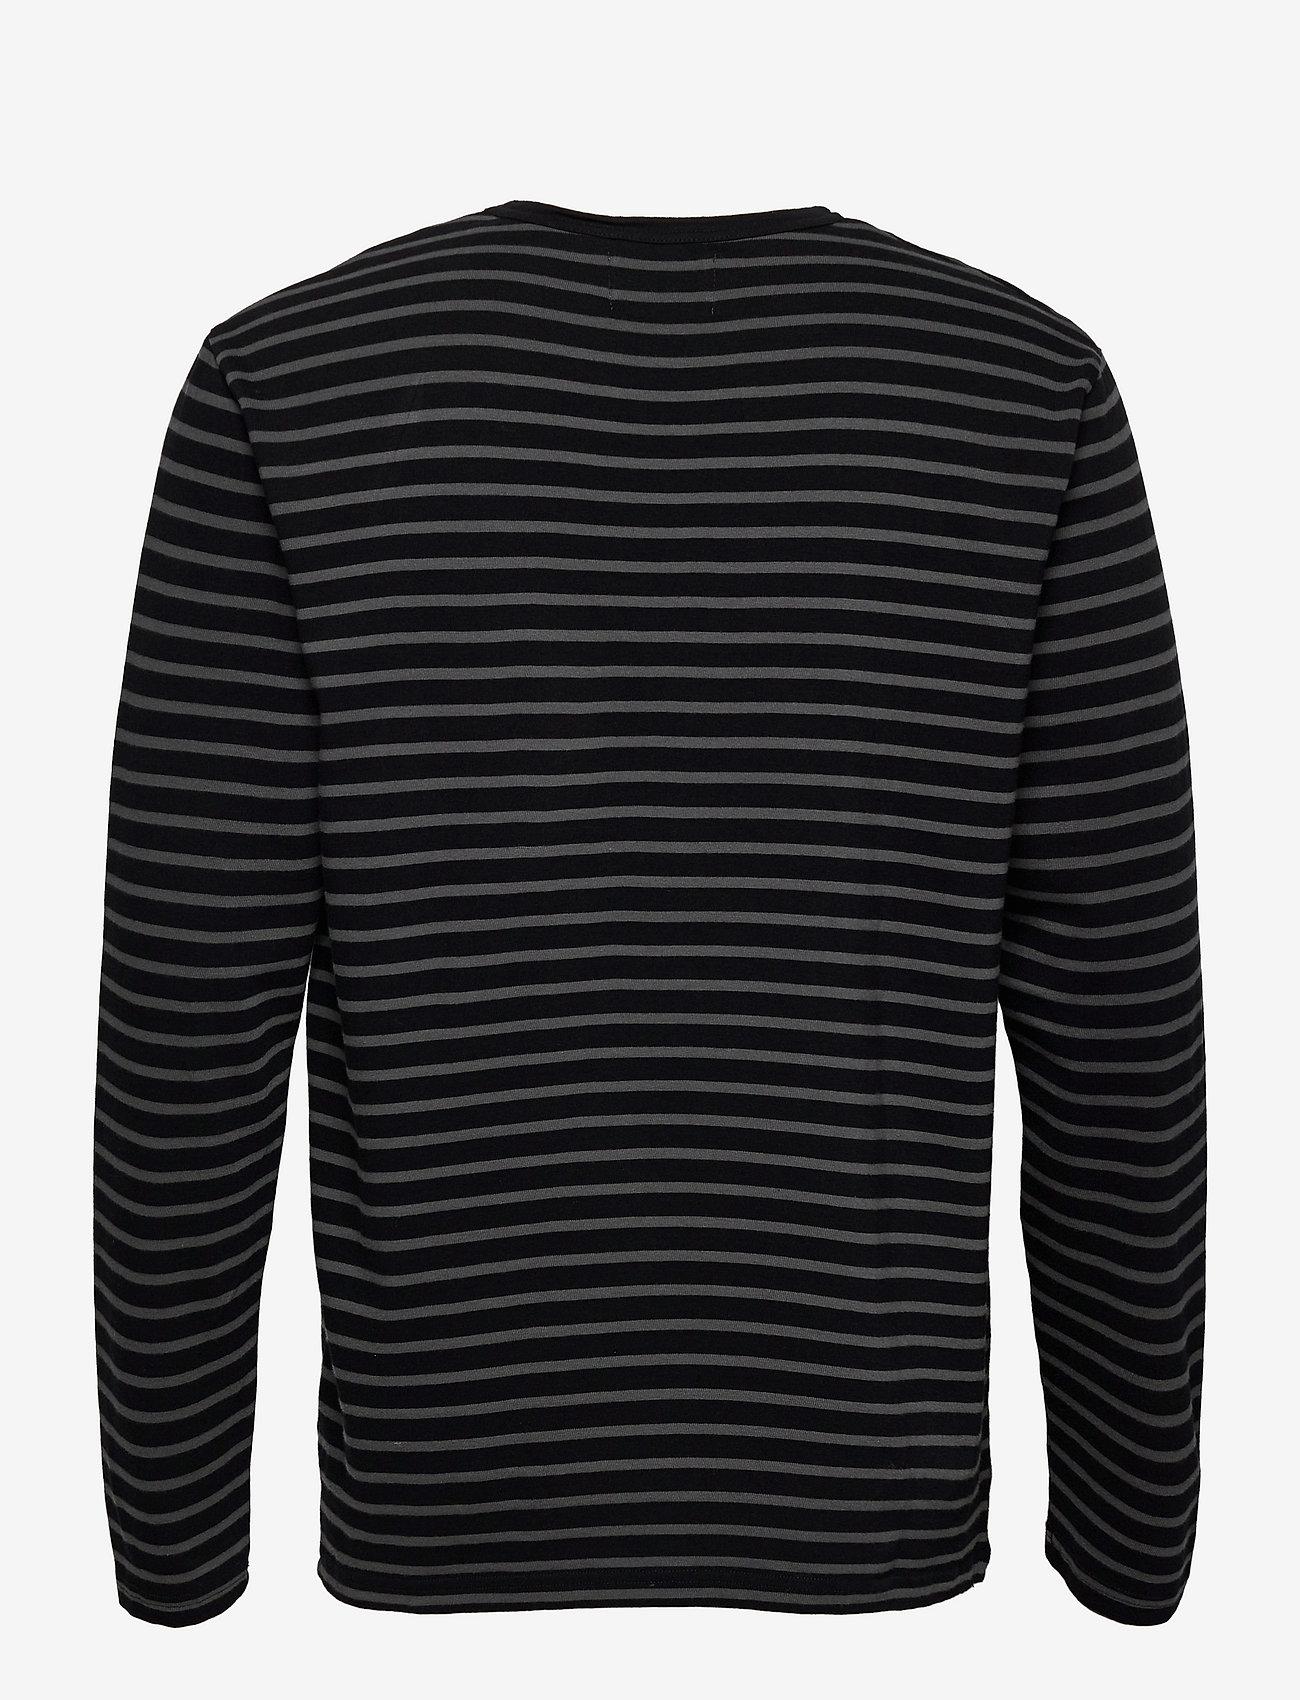 Wood Wood - Mel long sleeve - lange mouwen - black/grey stripes - 1